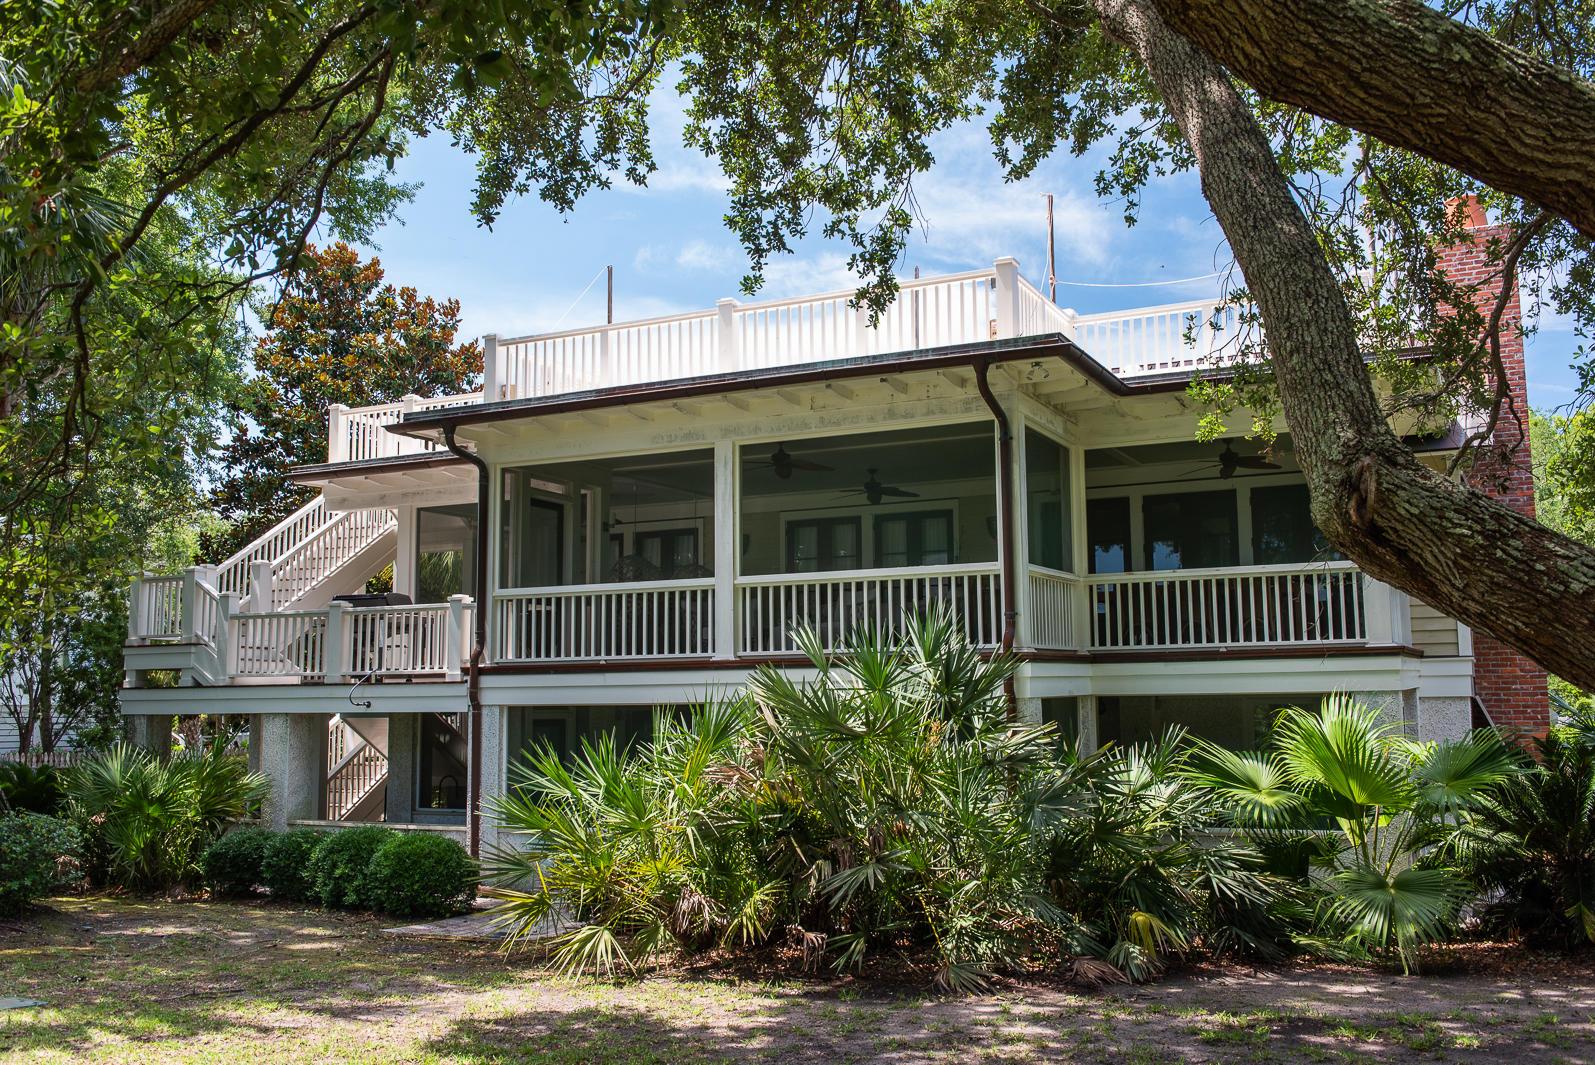 Sullivans Island Homes For Sale - 1773 Atlantic, Sullivans Island, SC - 10